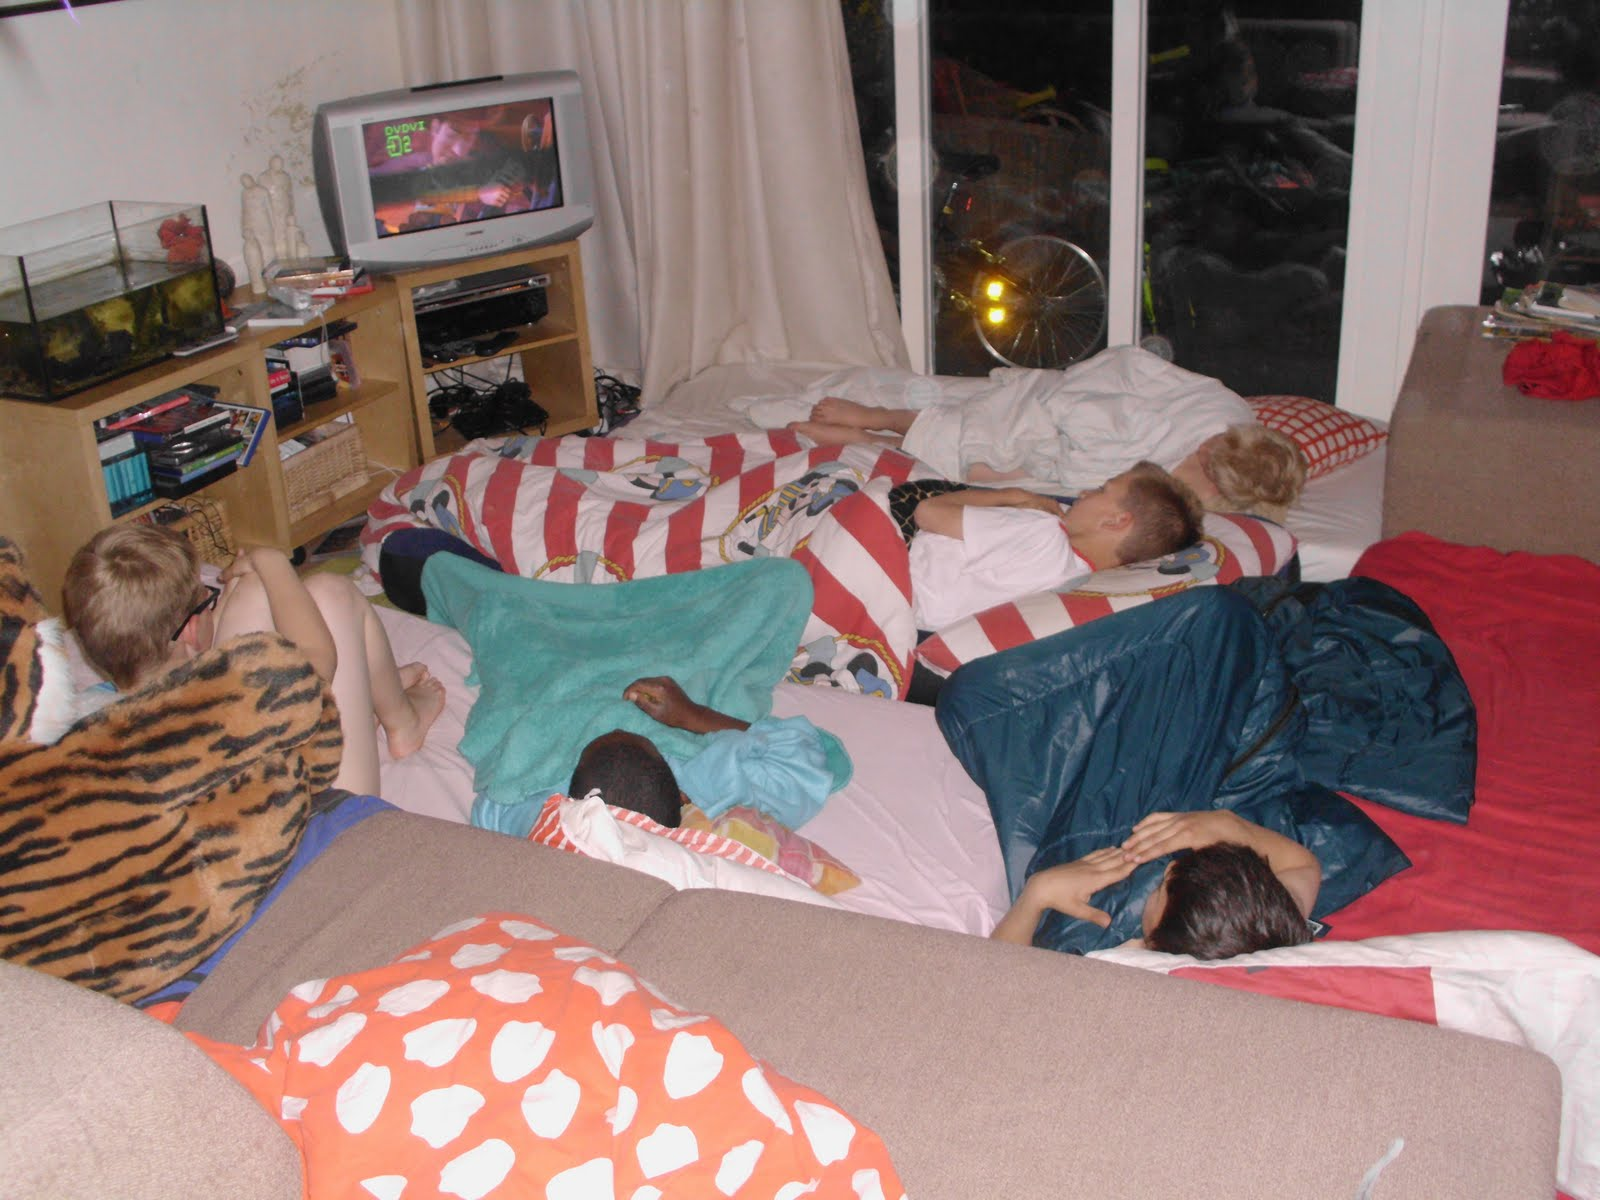 Super slaapfeestje meiden 11 jaar #WJ14